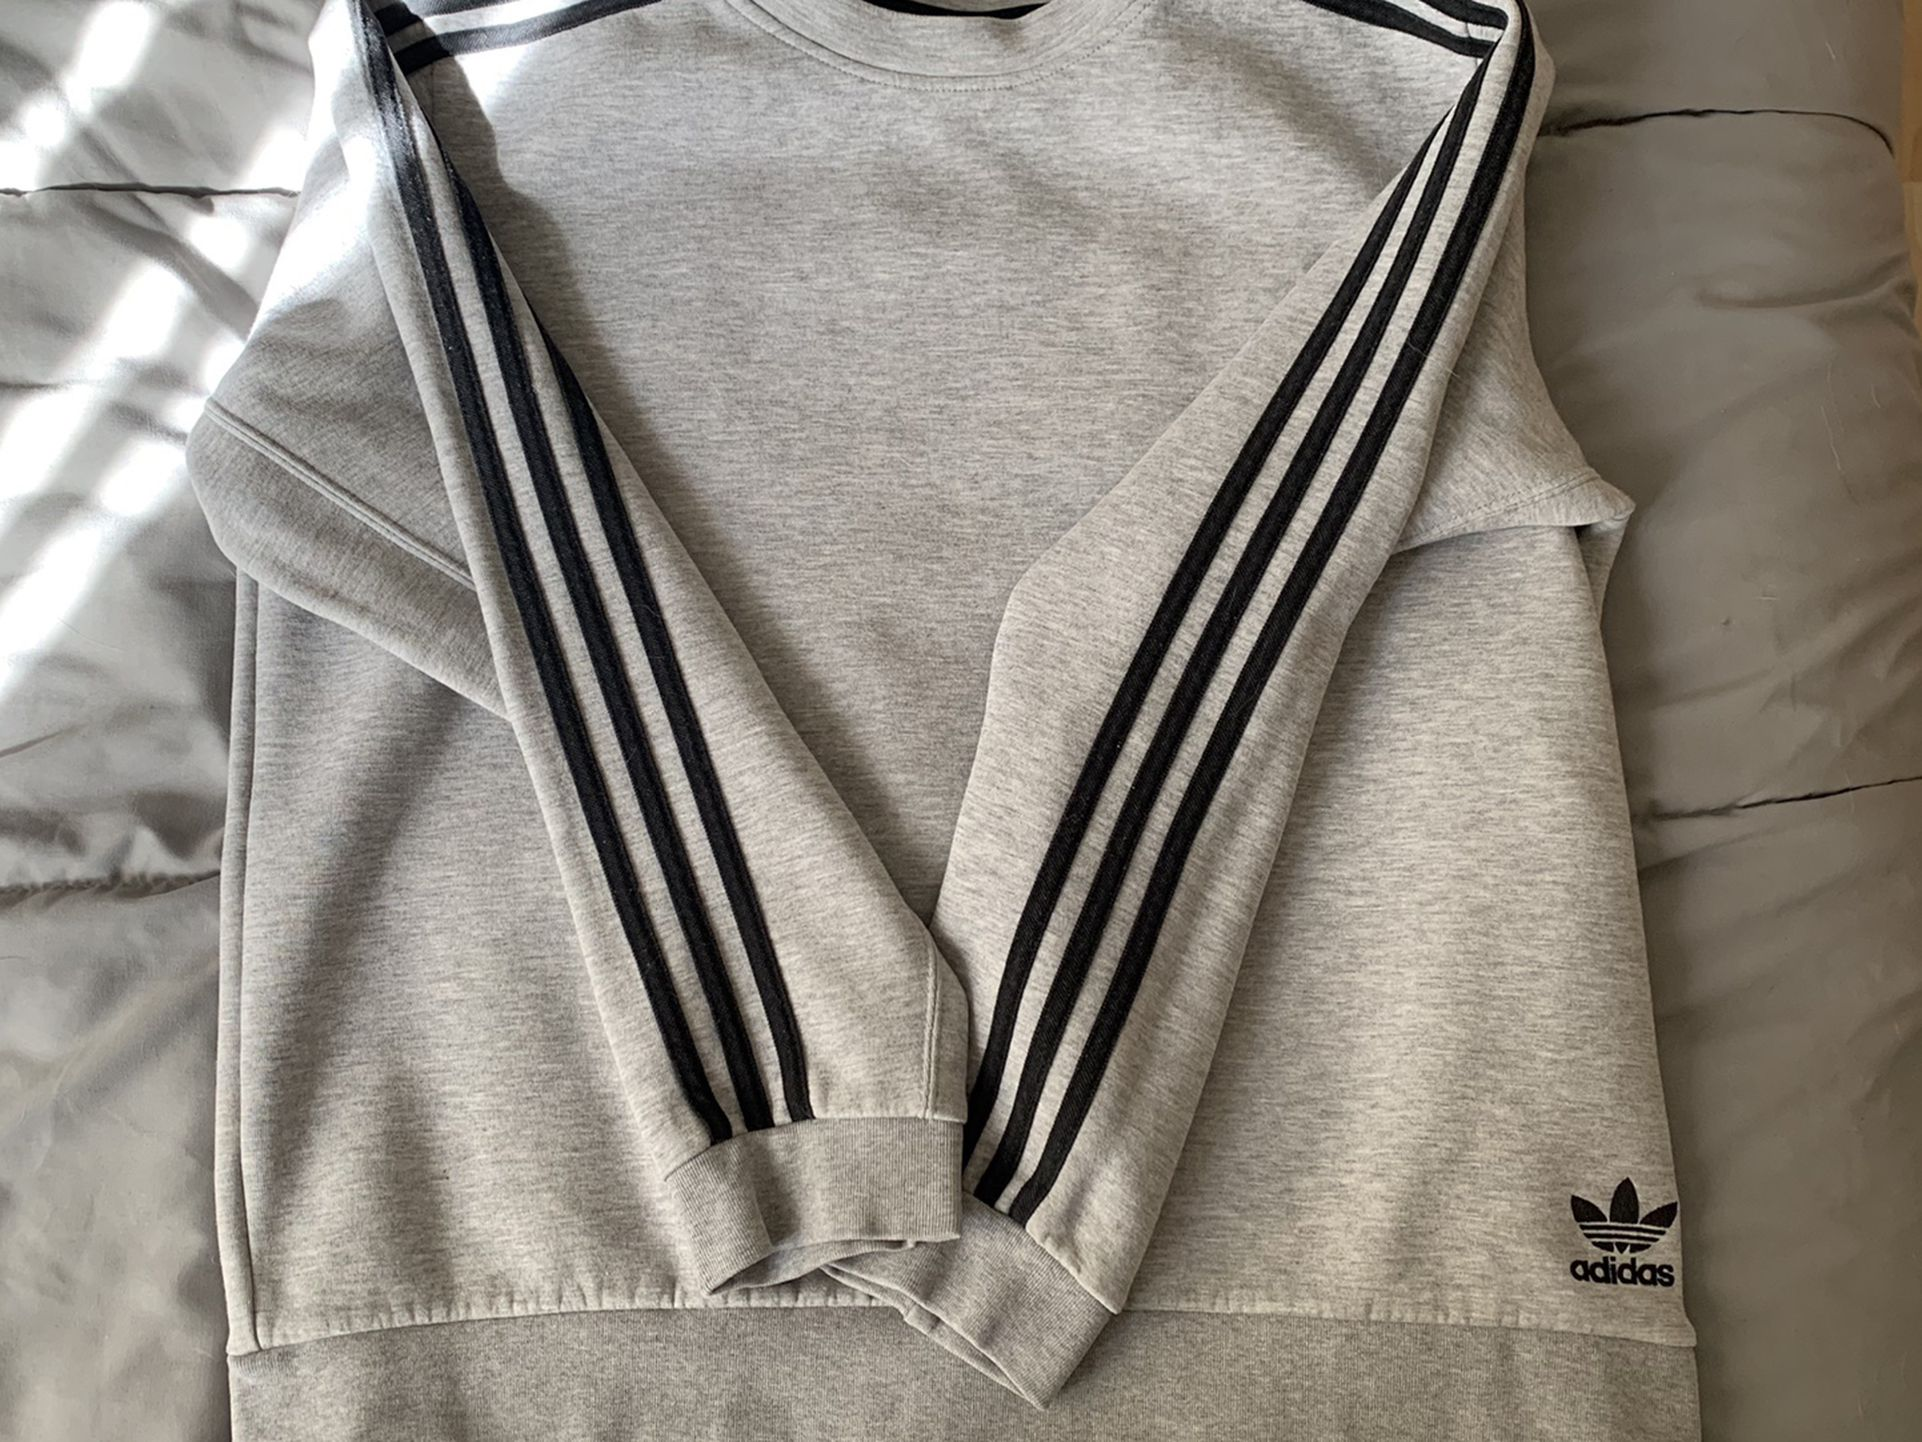 adidas Originals Crewneck Sweatshirt Size M